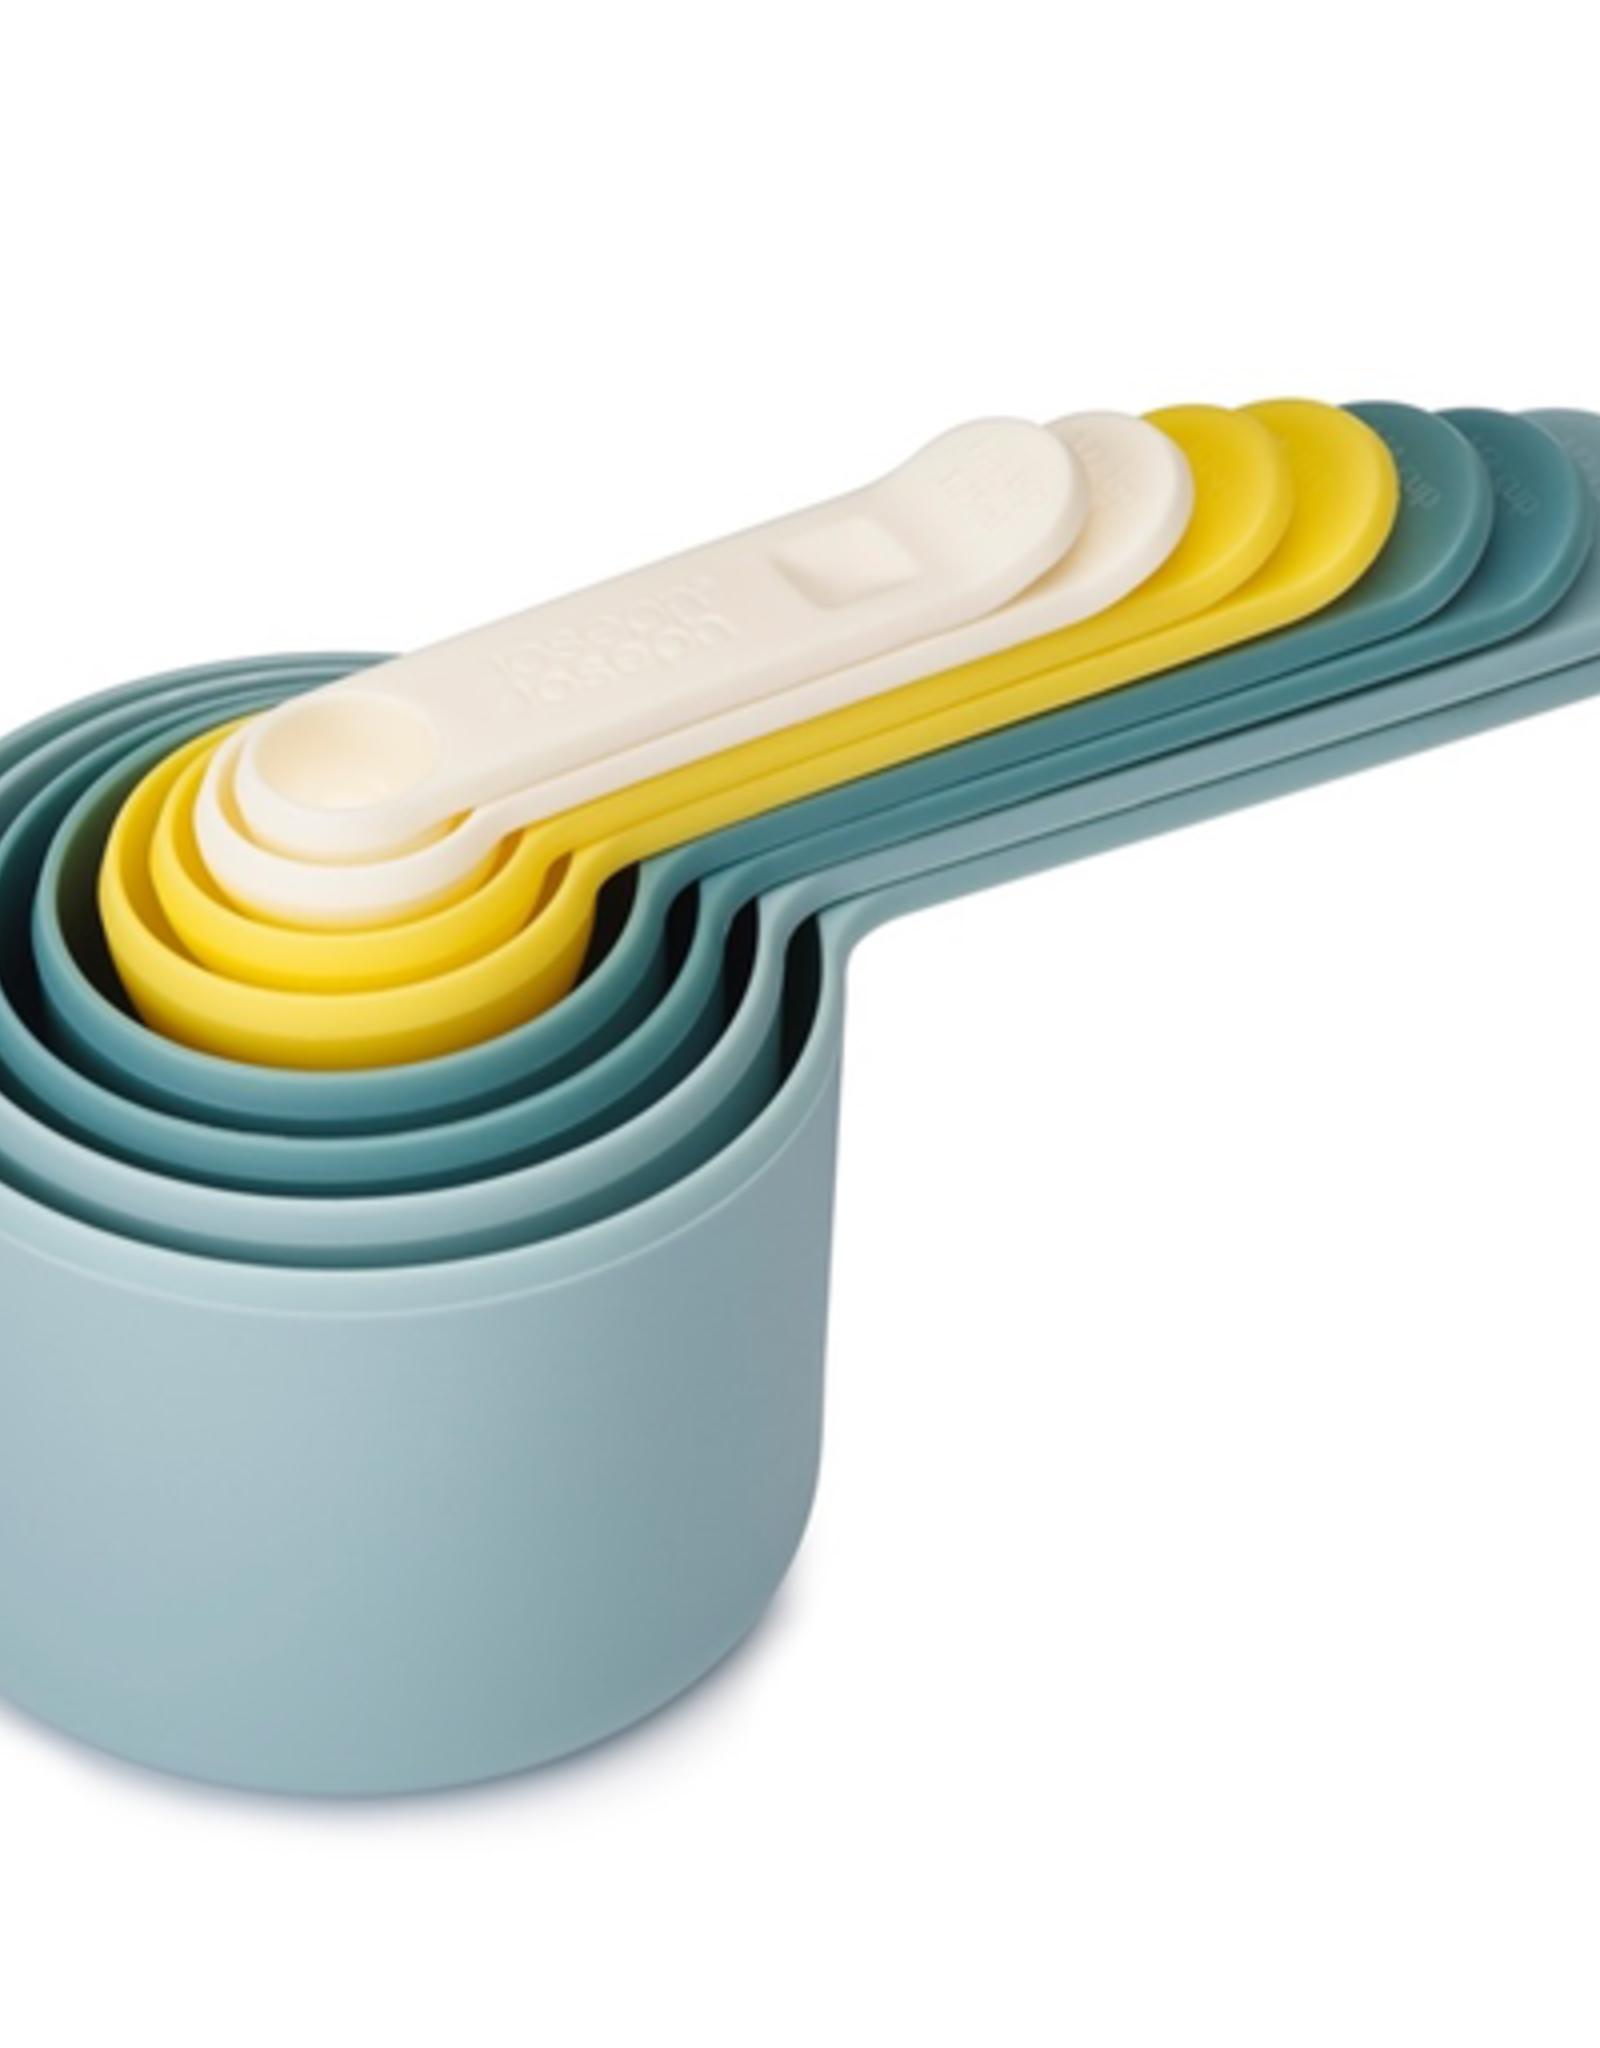 Joseph Joseph Opal Nest Measuring Cups/Spoons Set/8